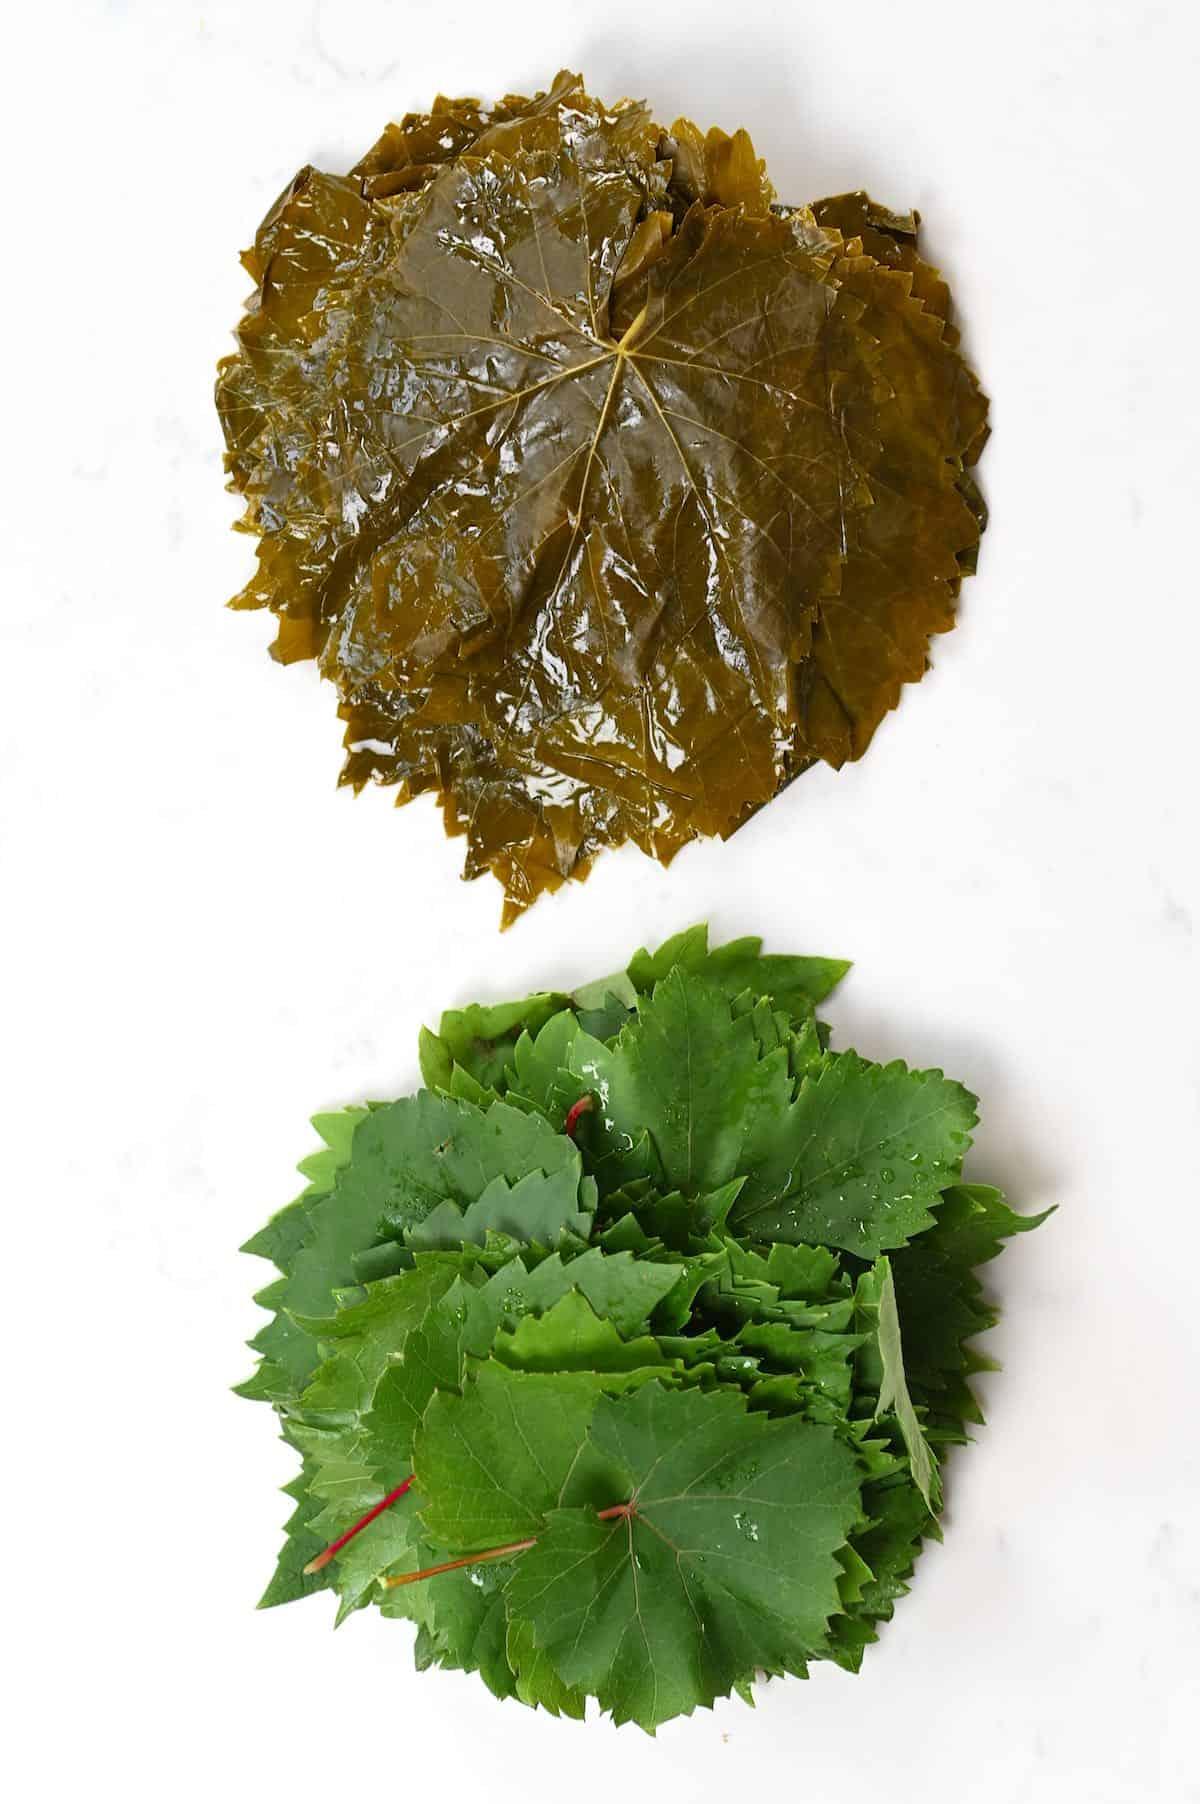 Preserved vs green vine leaves